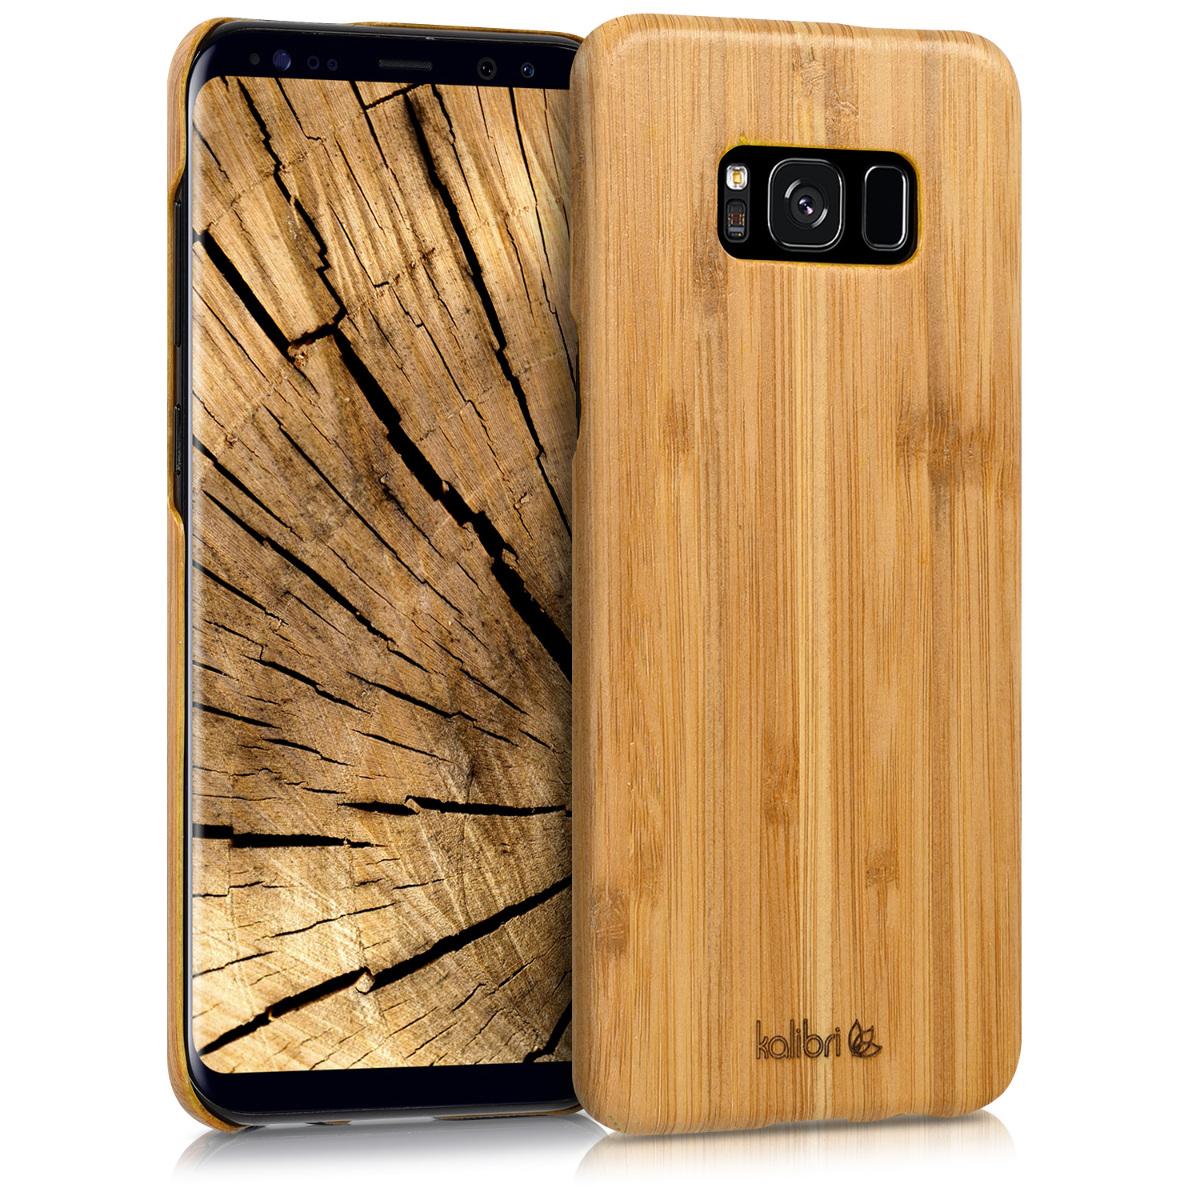 Kalibri Σκληρή Ξύλινη Θήκη Samsung Galaxy S8 Plus (42161.24)